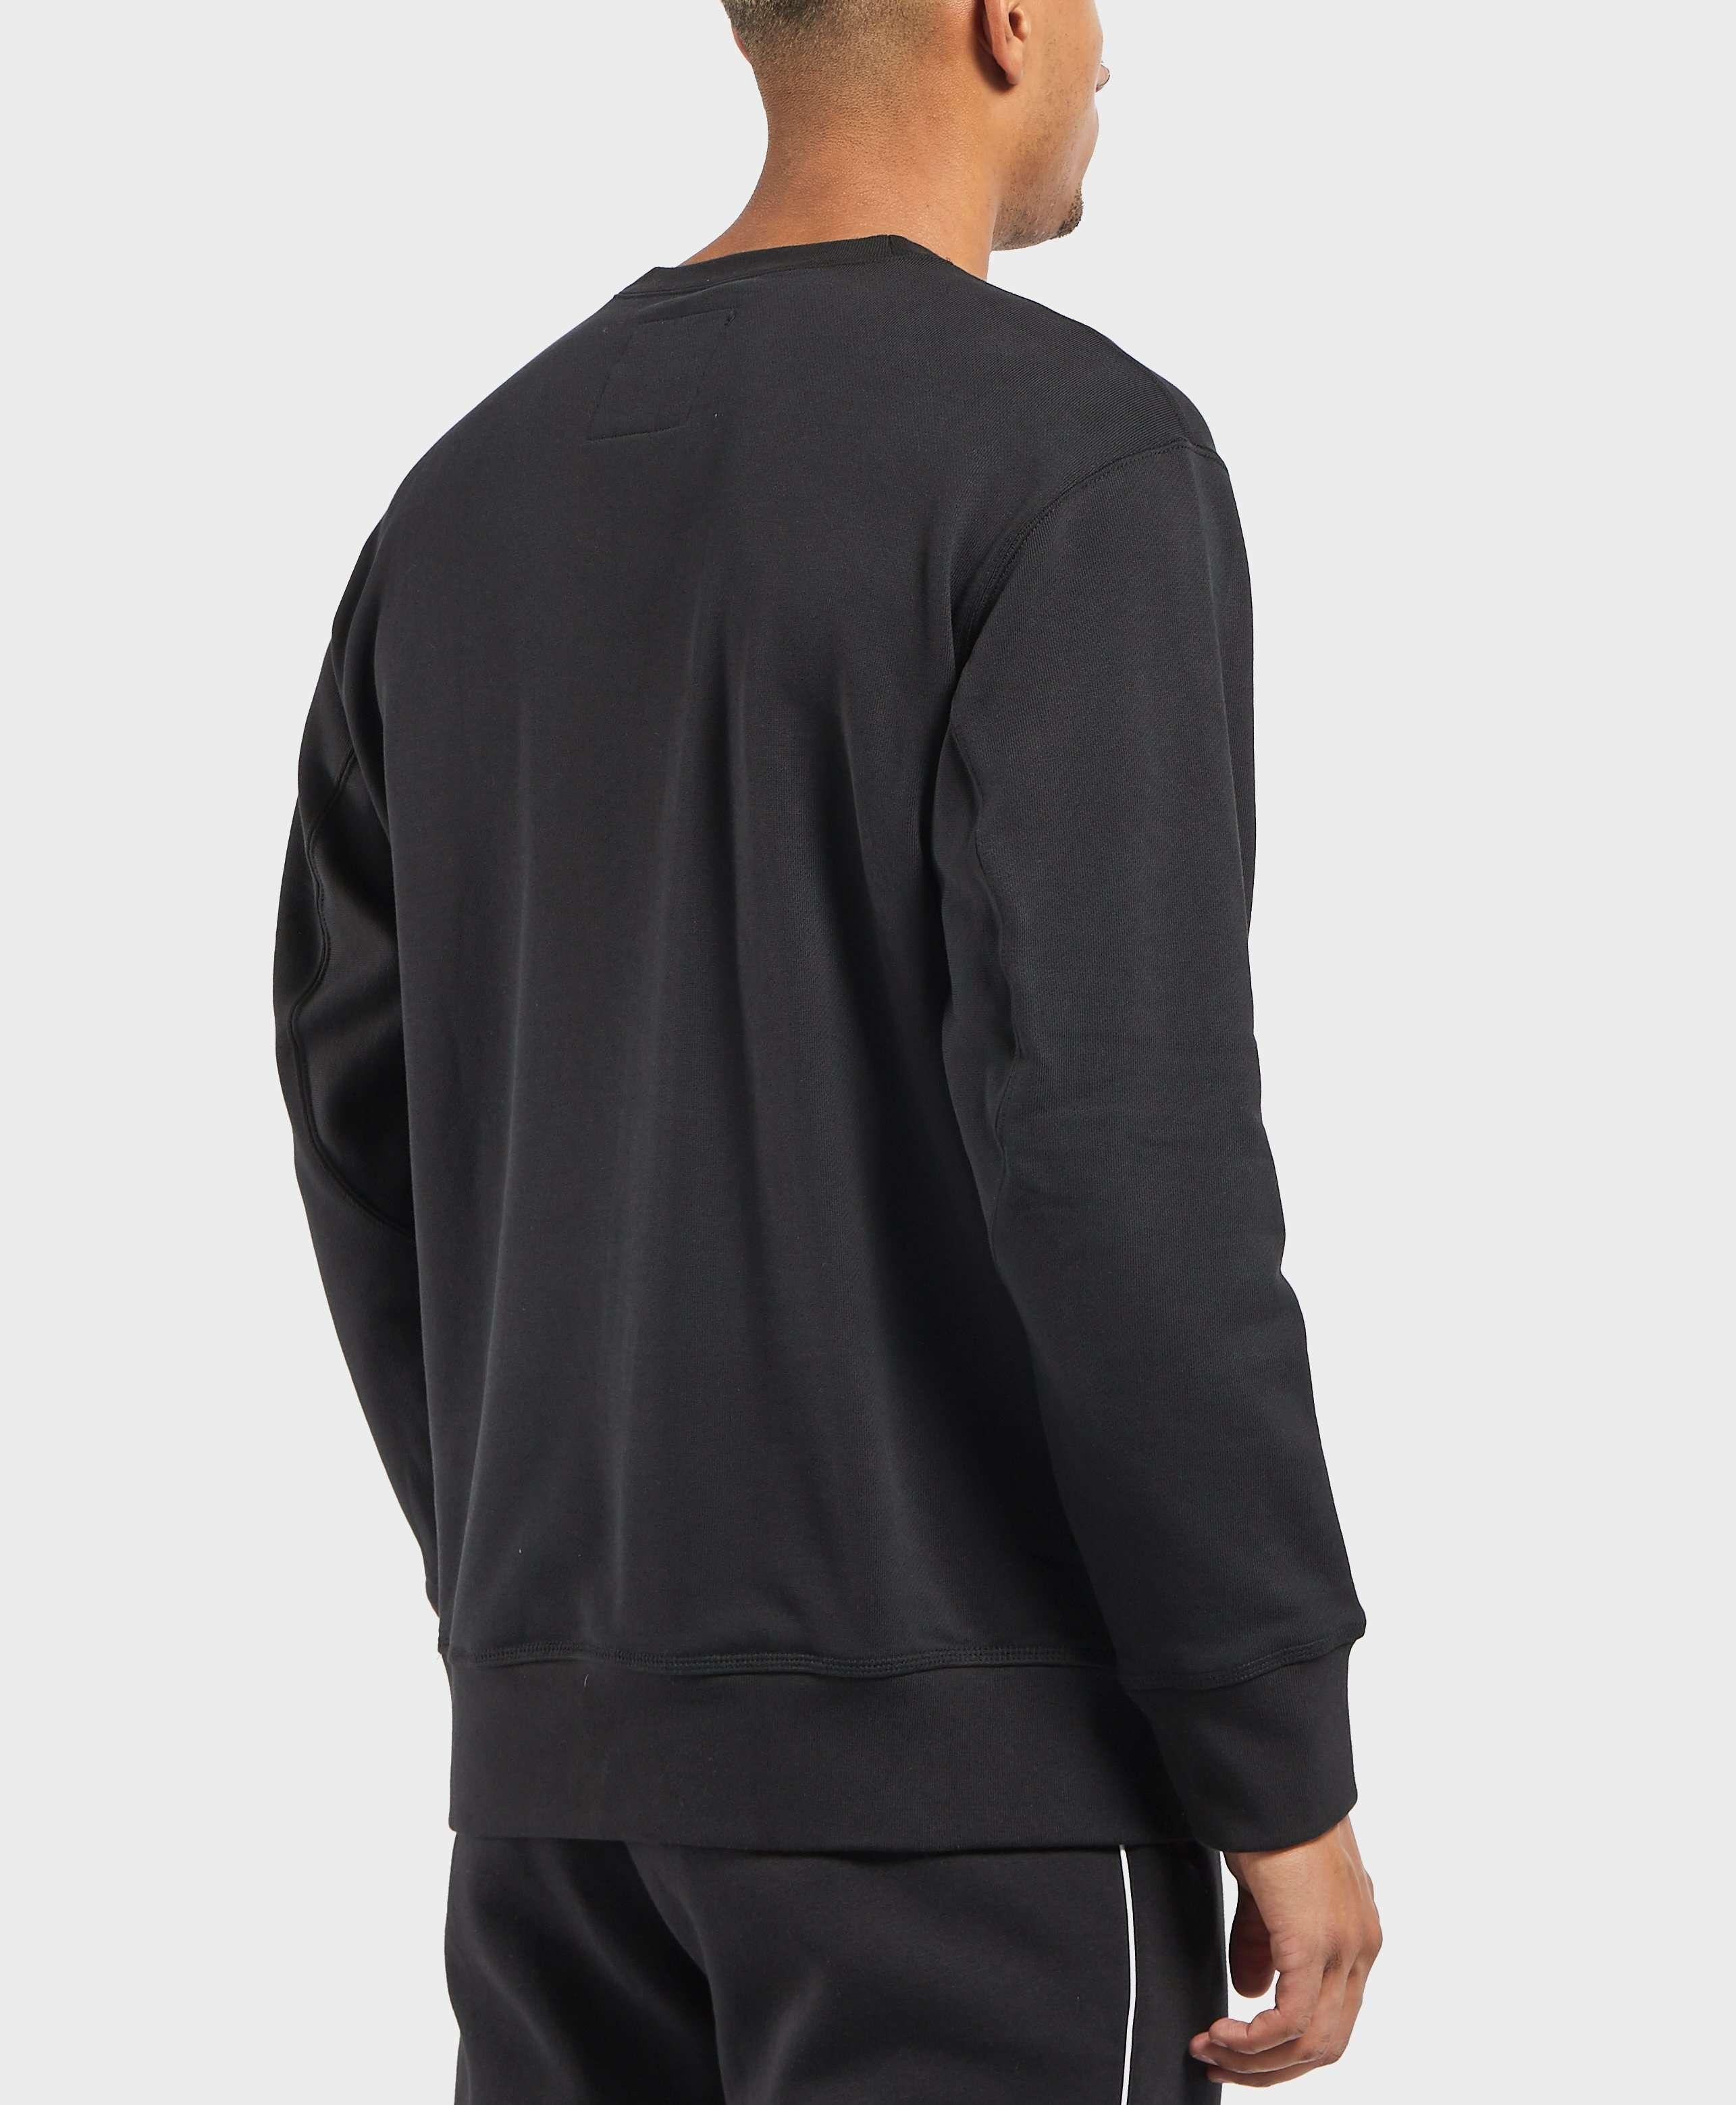 adidas Originals Kaval Crew Sweatshirt